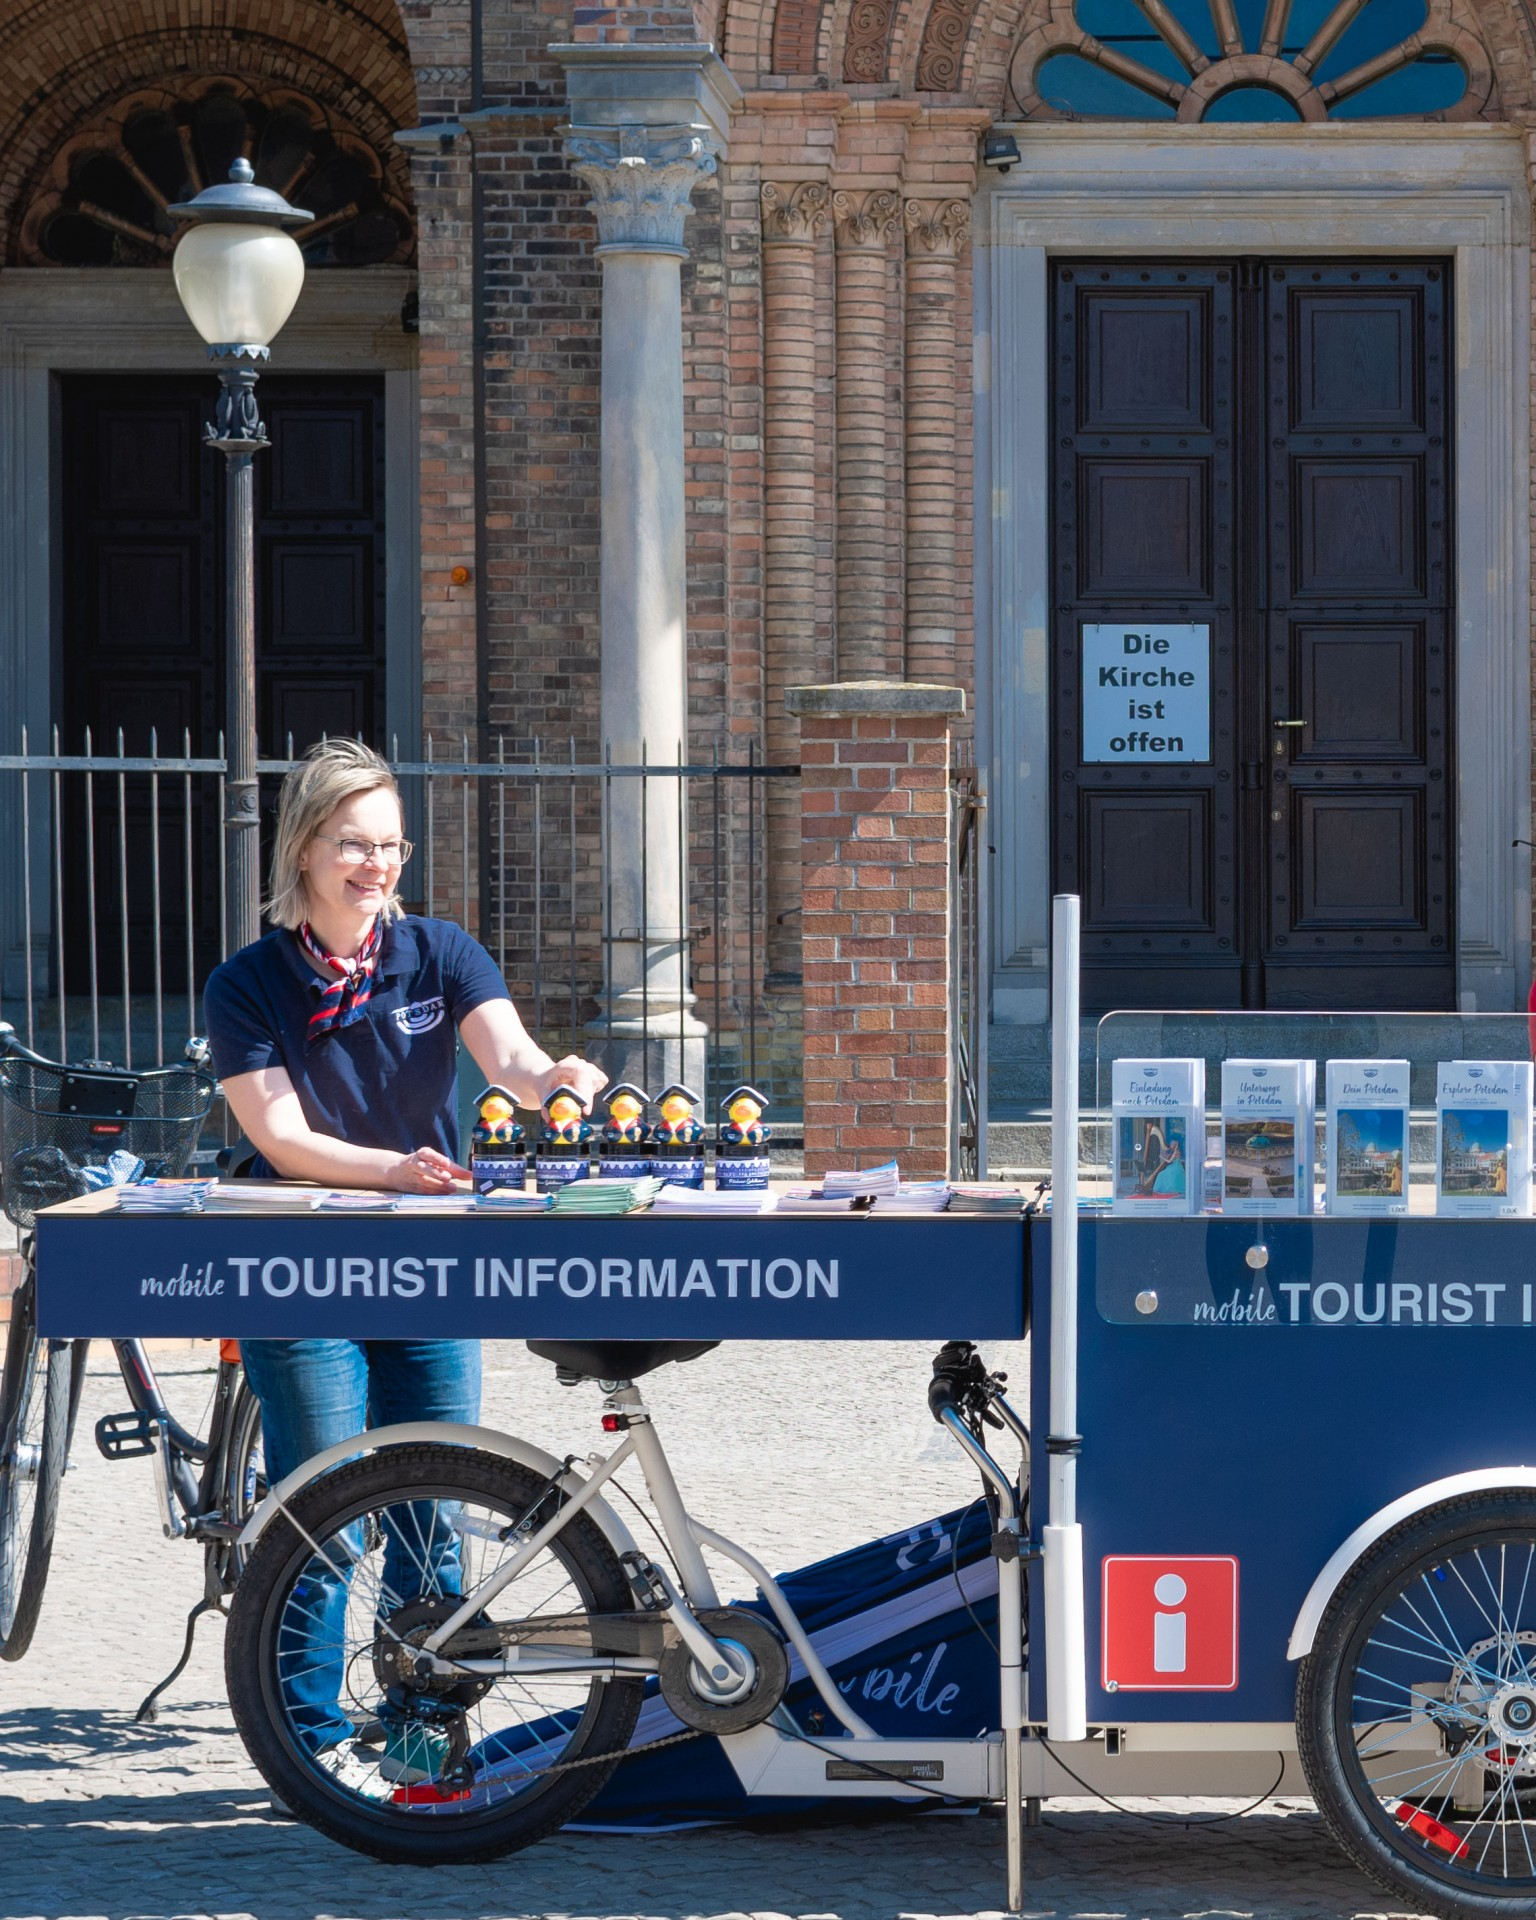 Mobile Tourist Information, Foto: PMSG